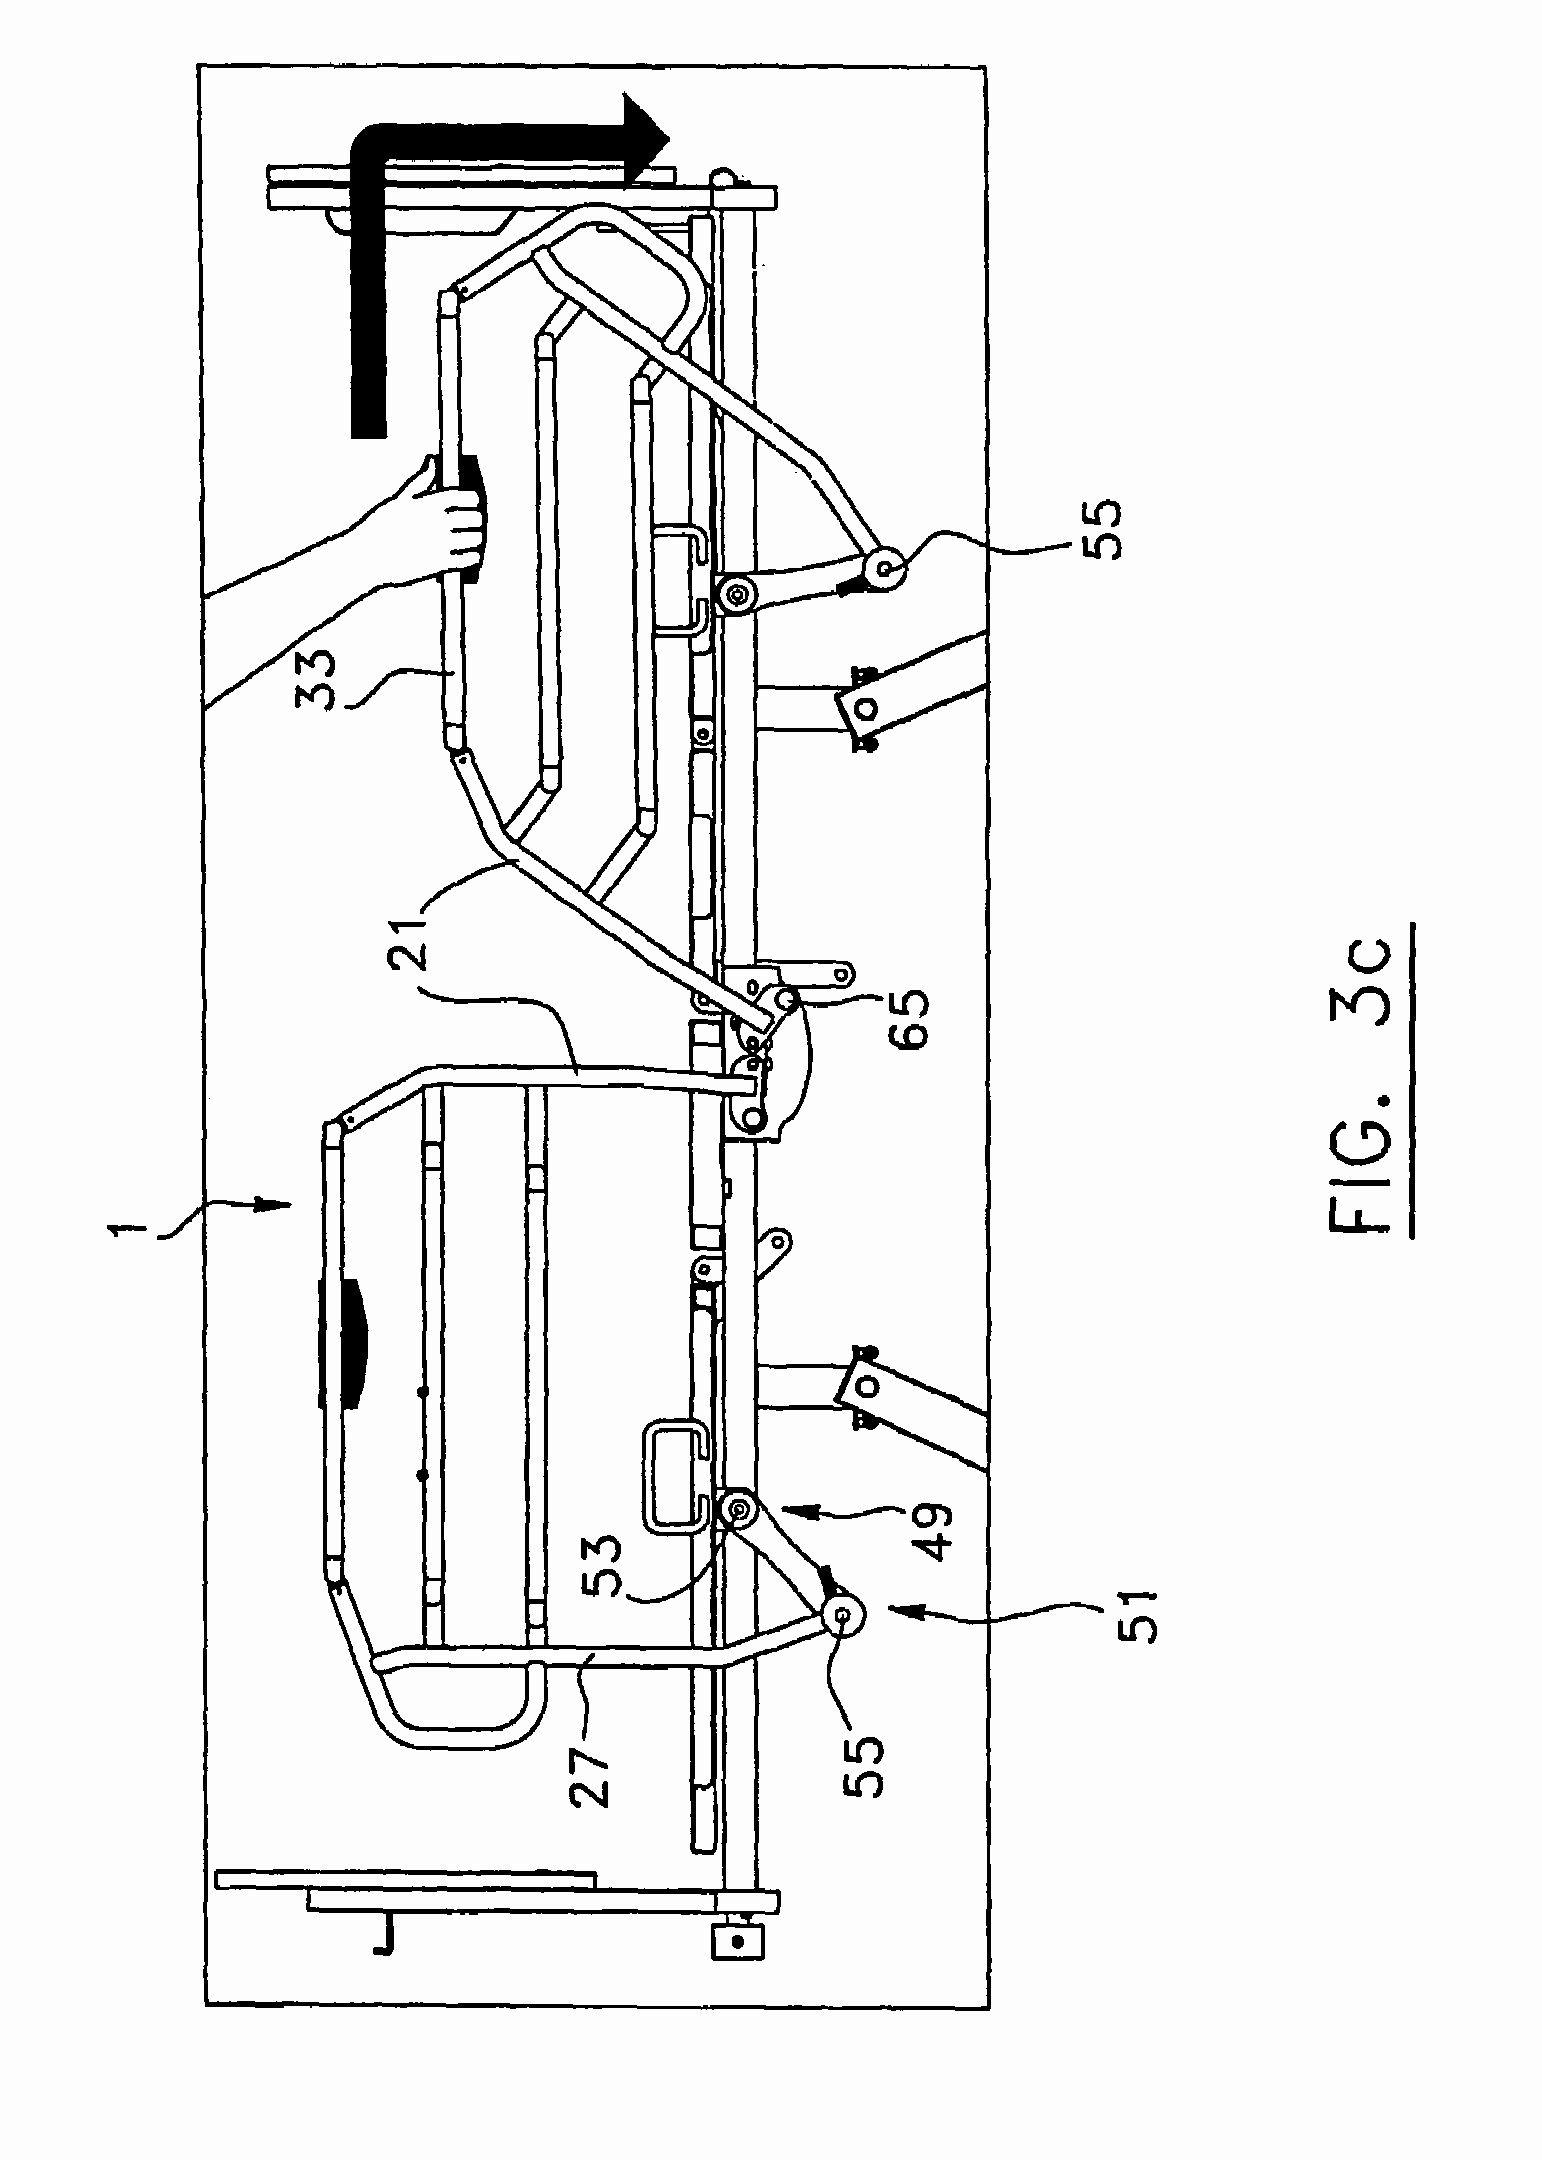 hight resolution of gm internal regulator alternator wiring wiring diagram gm alternator wiring diagram internal regulator